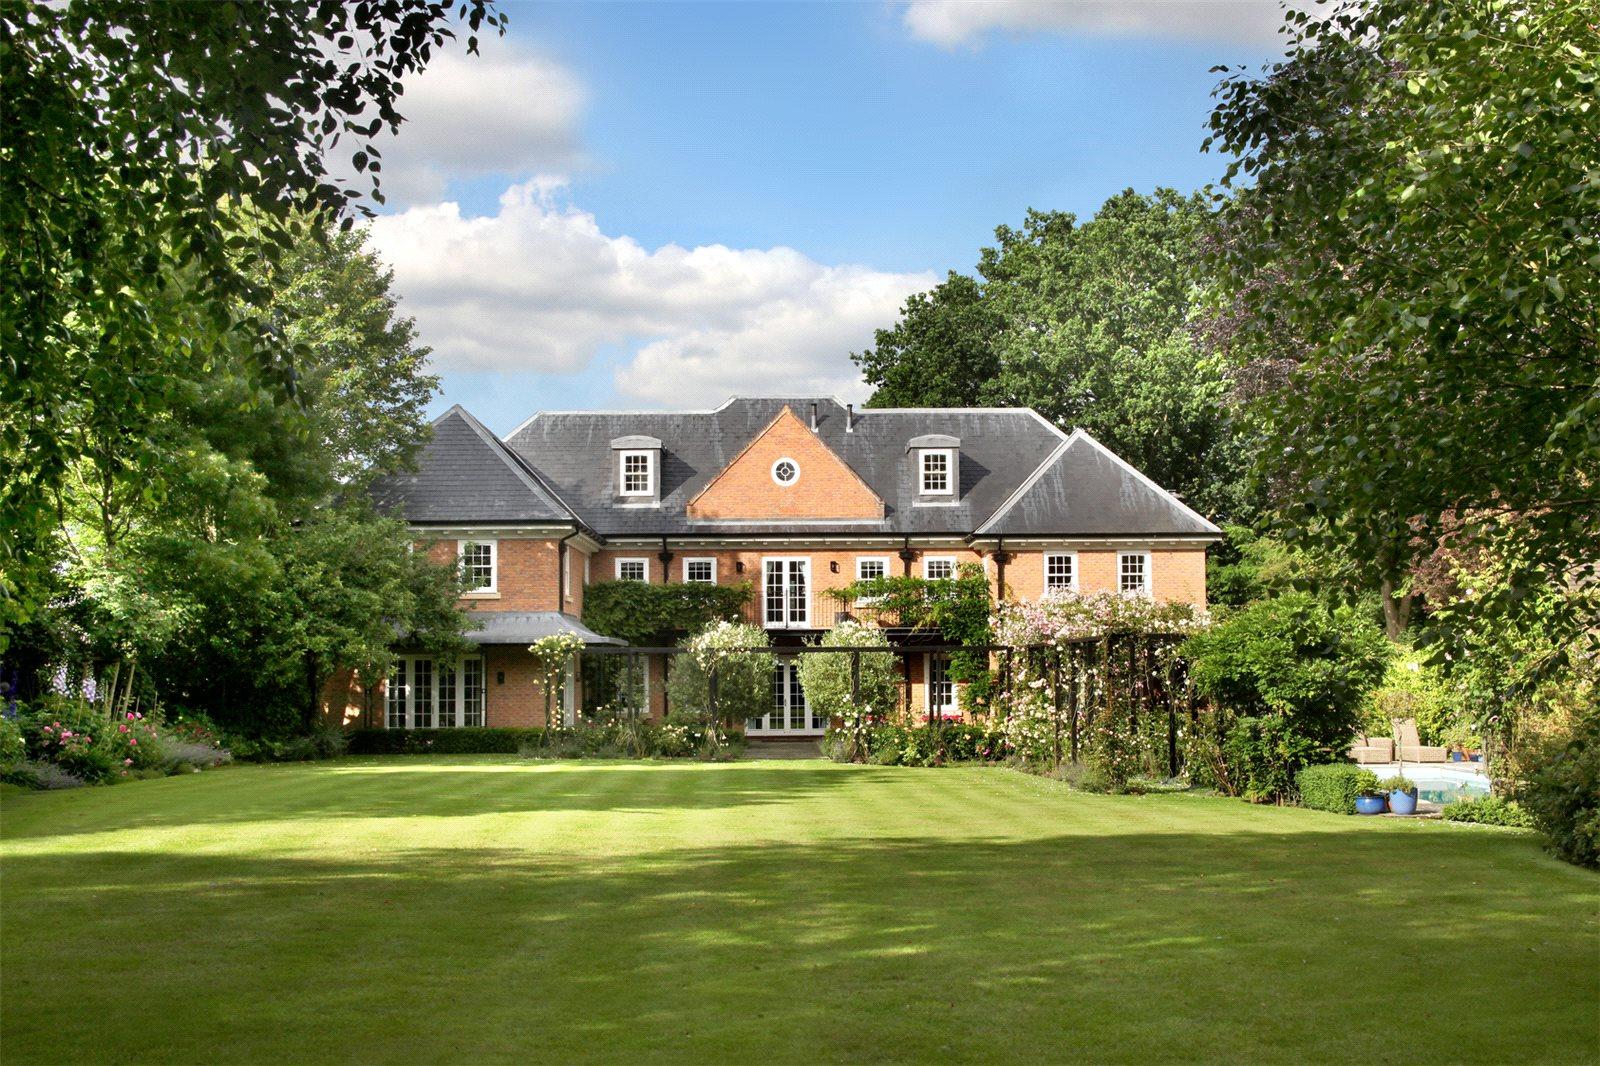 Villa per Vendita alle ore Priory Road, Sunningdale, Ascot, Berkshire, SL5 Ascot, Inghilterra